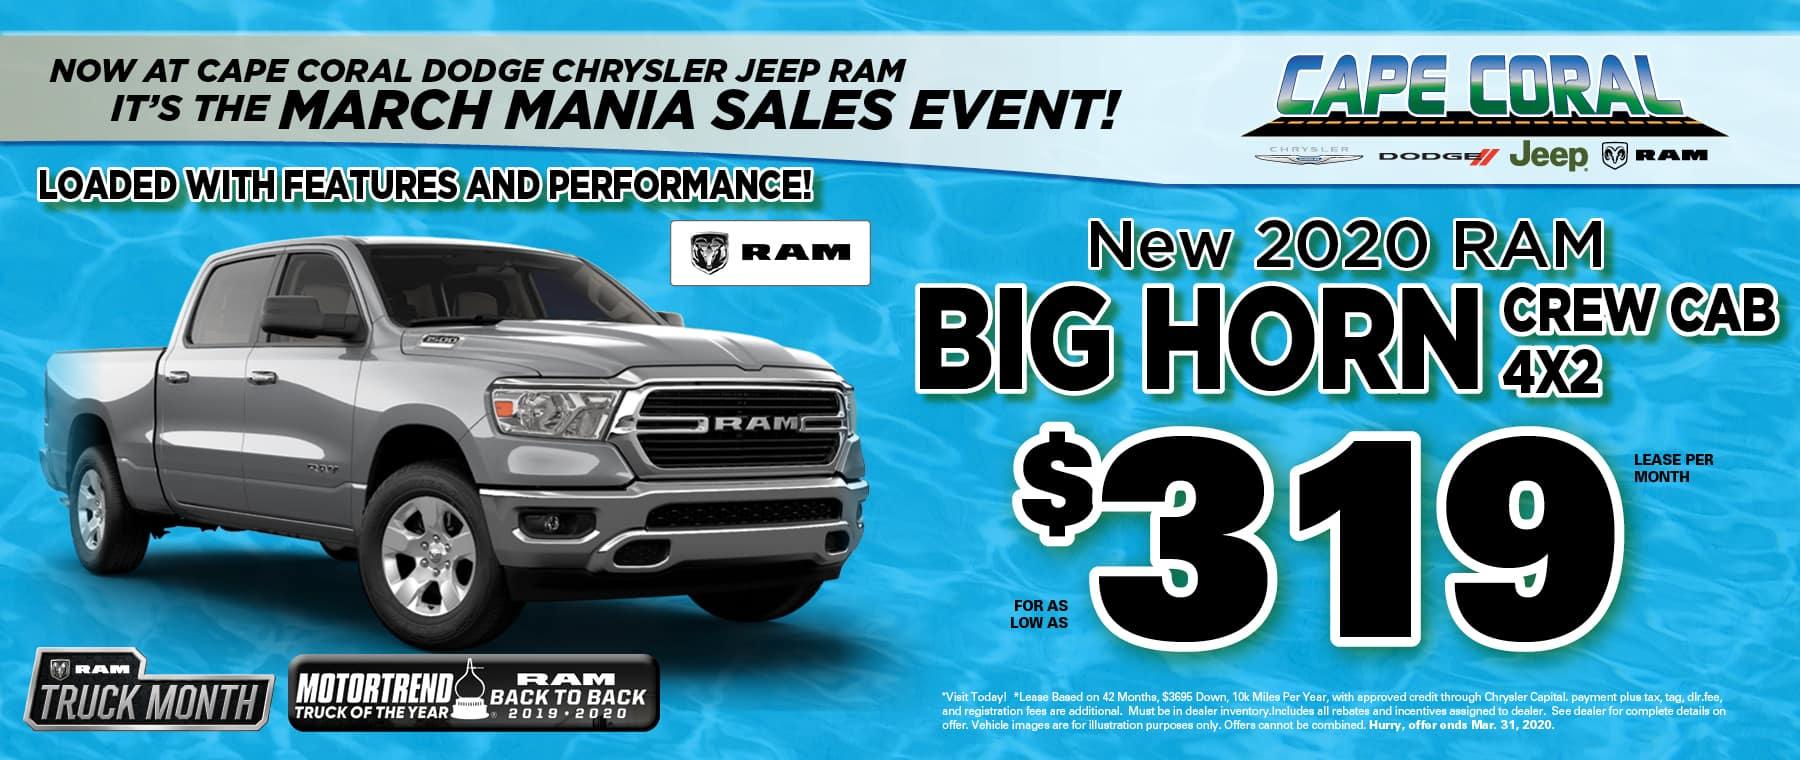 New Ram Big Horn Trucks!